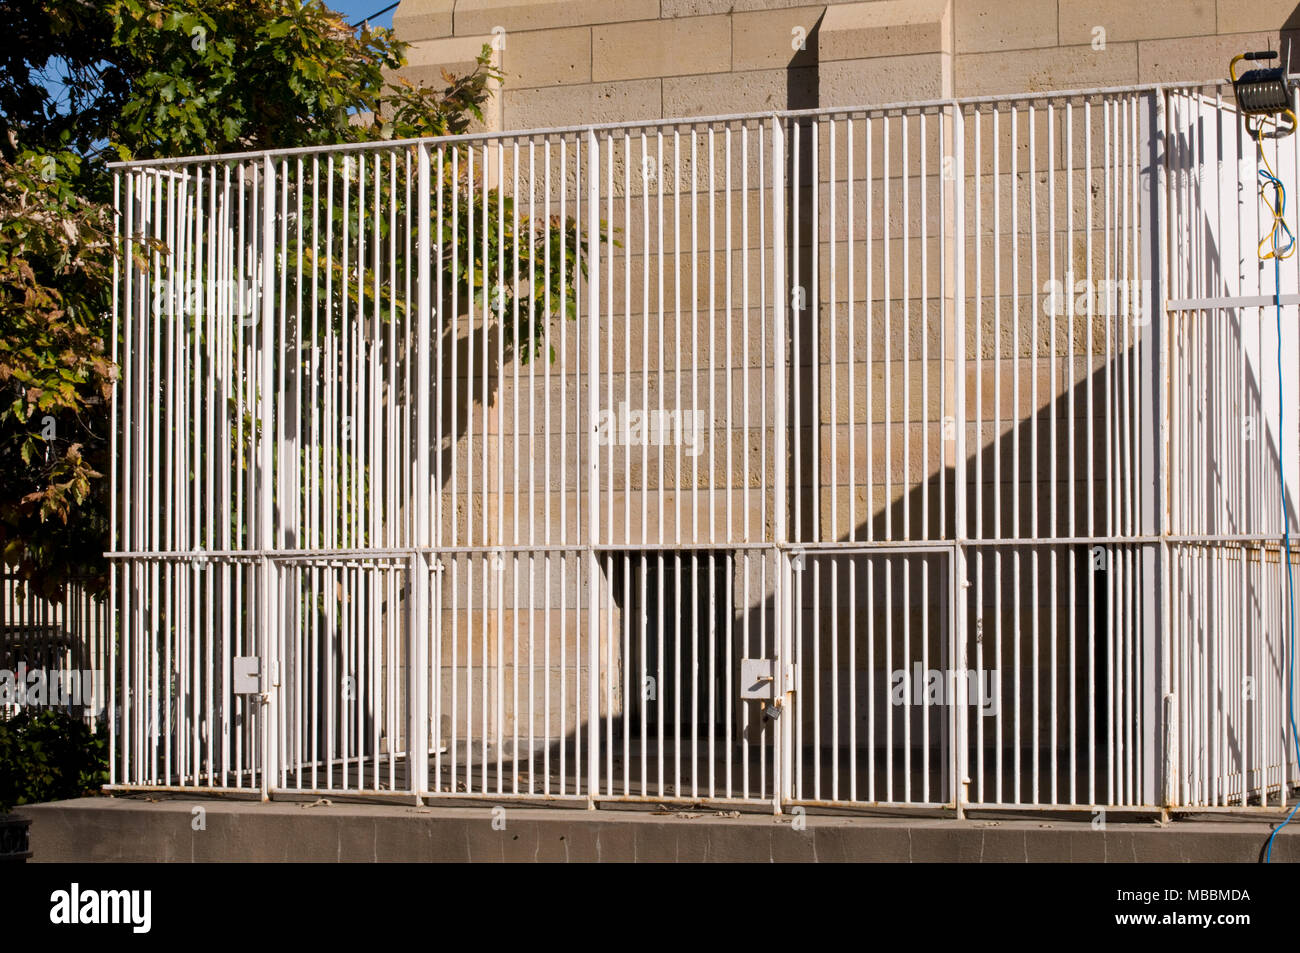 St. Paul, Minnesota. Como zoo. Empty animal cage in a zoo. - Stock Image